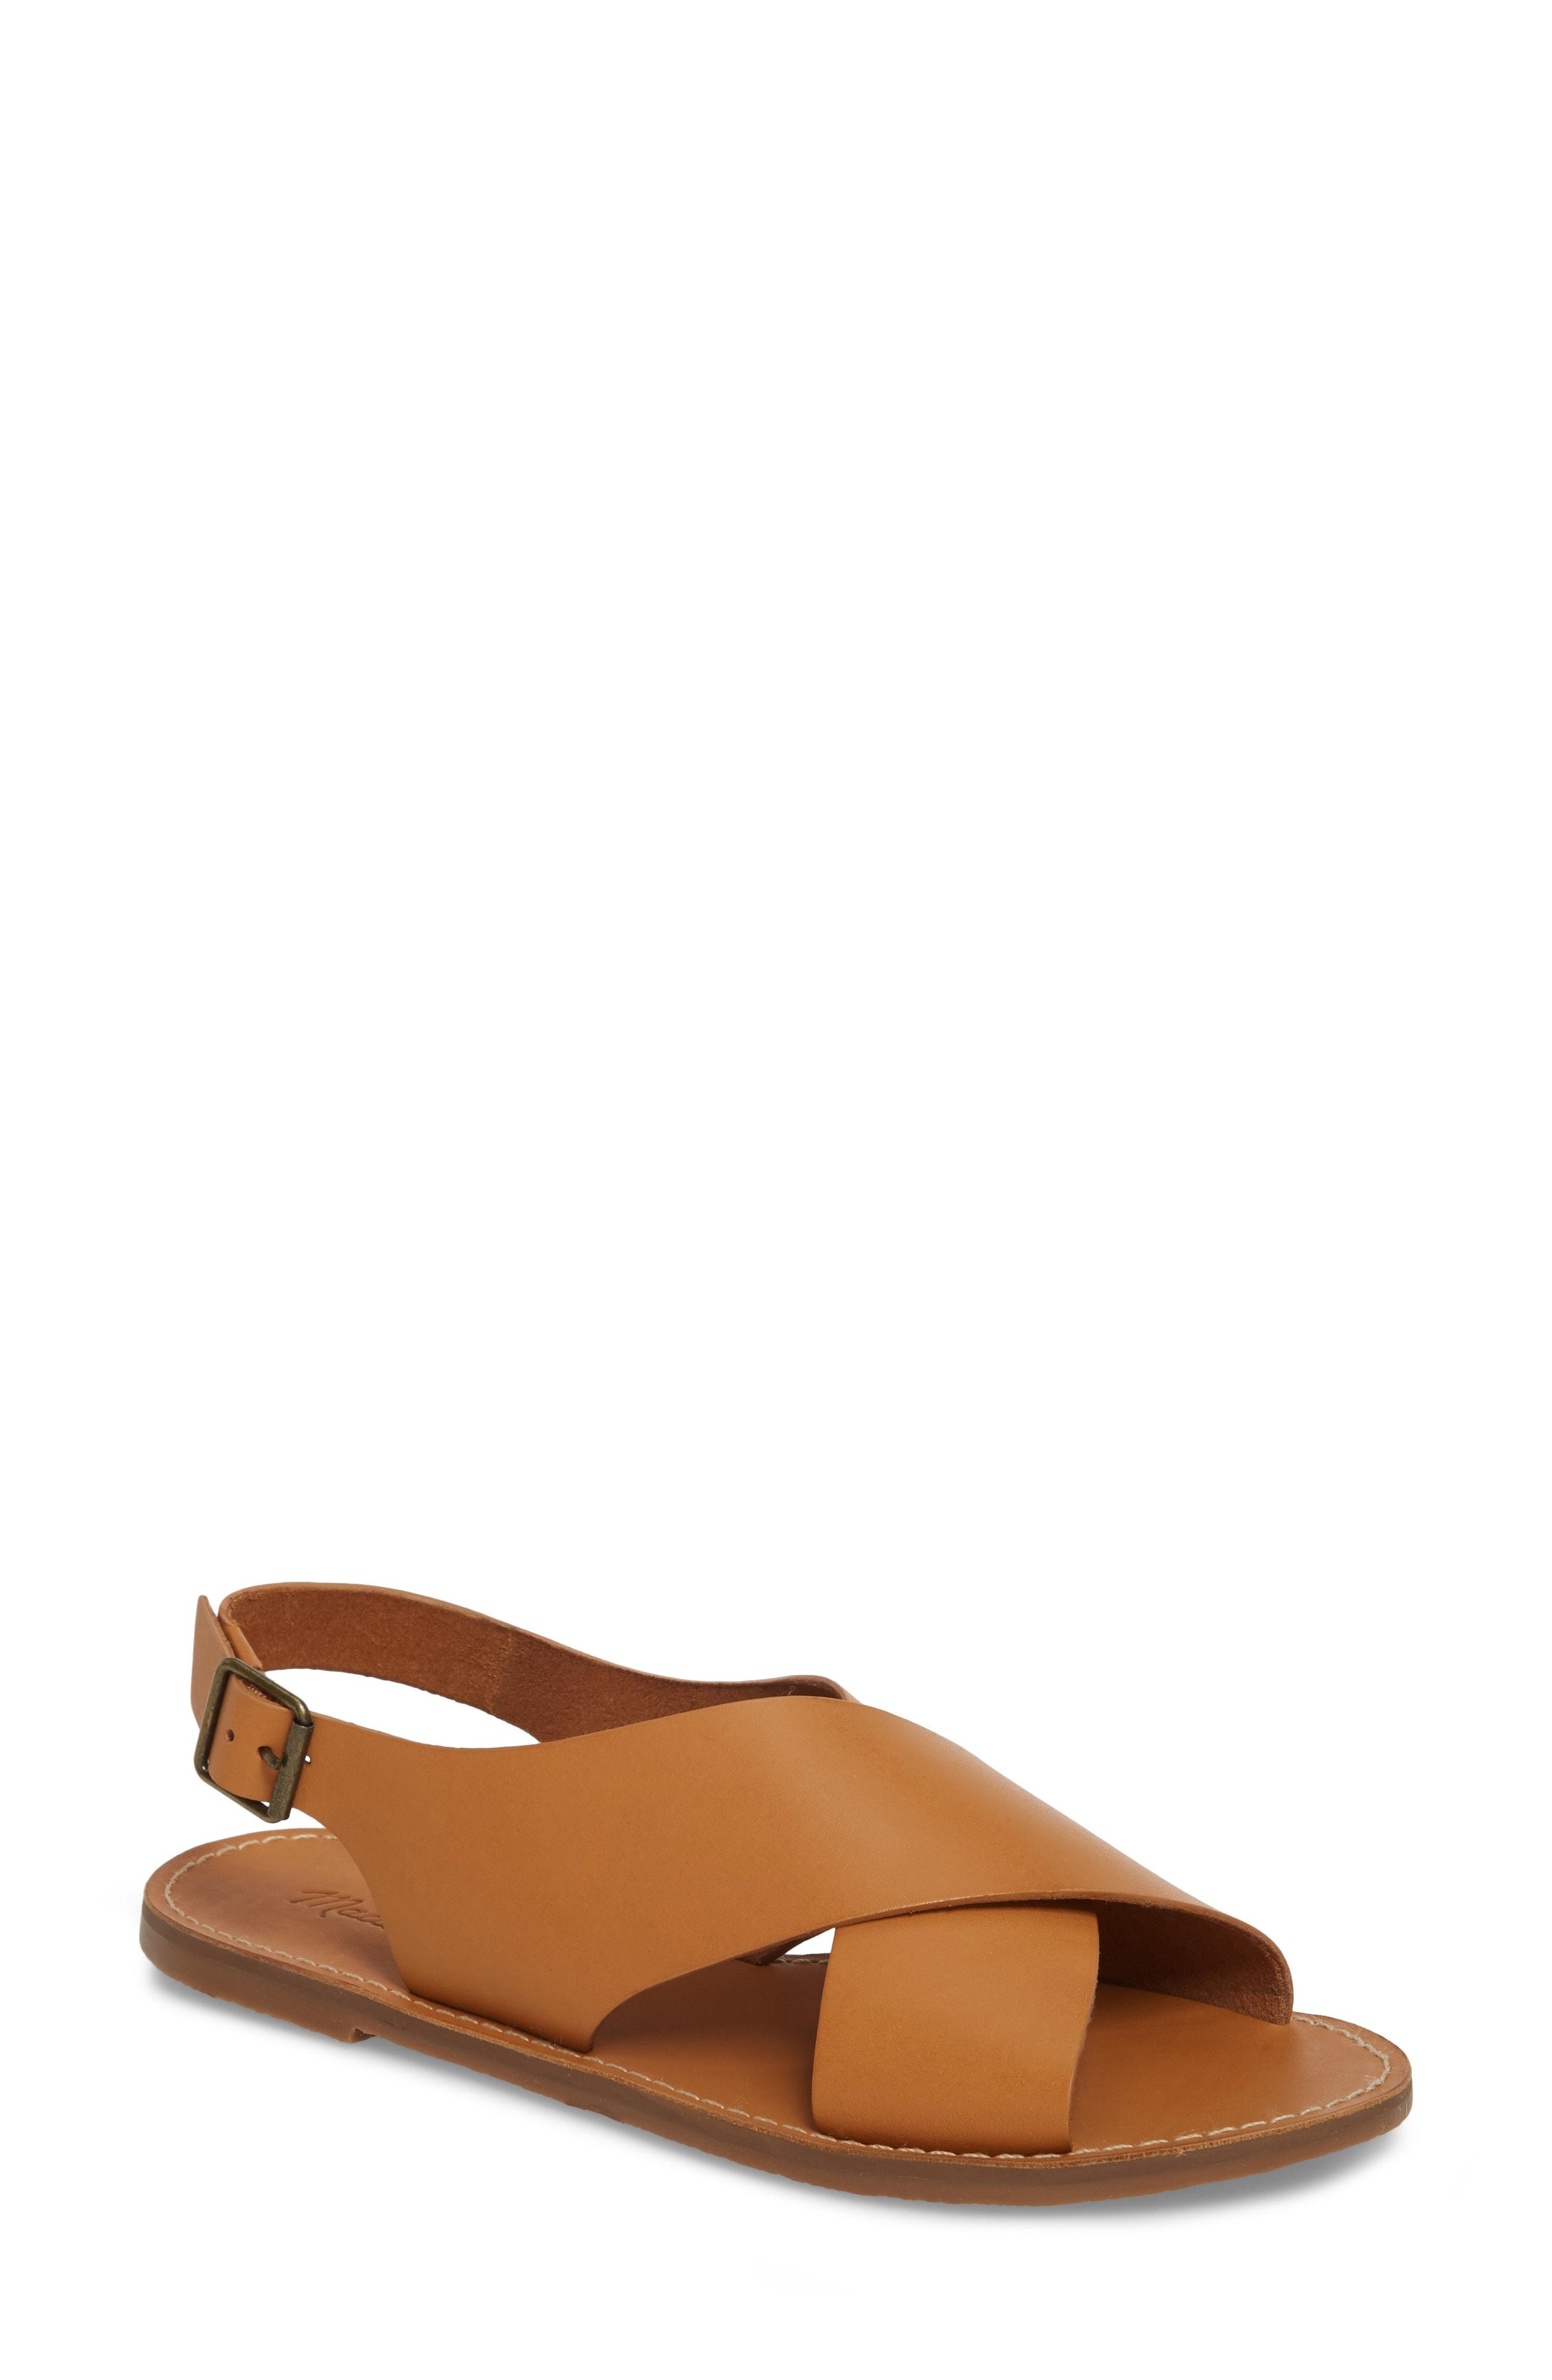 Madewell Boardwalk Flat Sandal (Women)